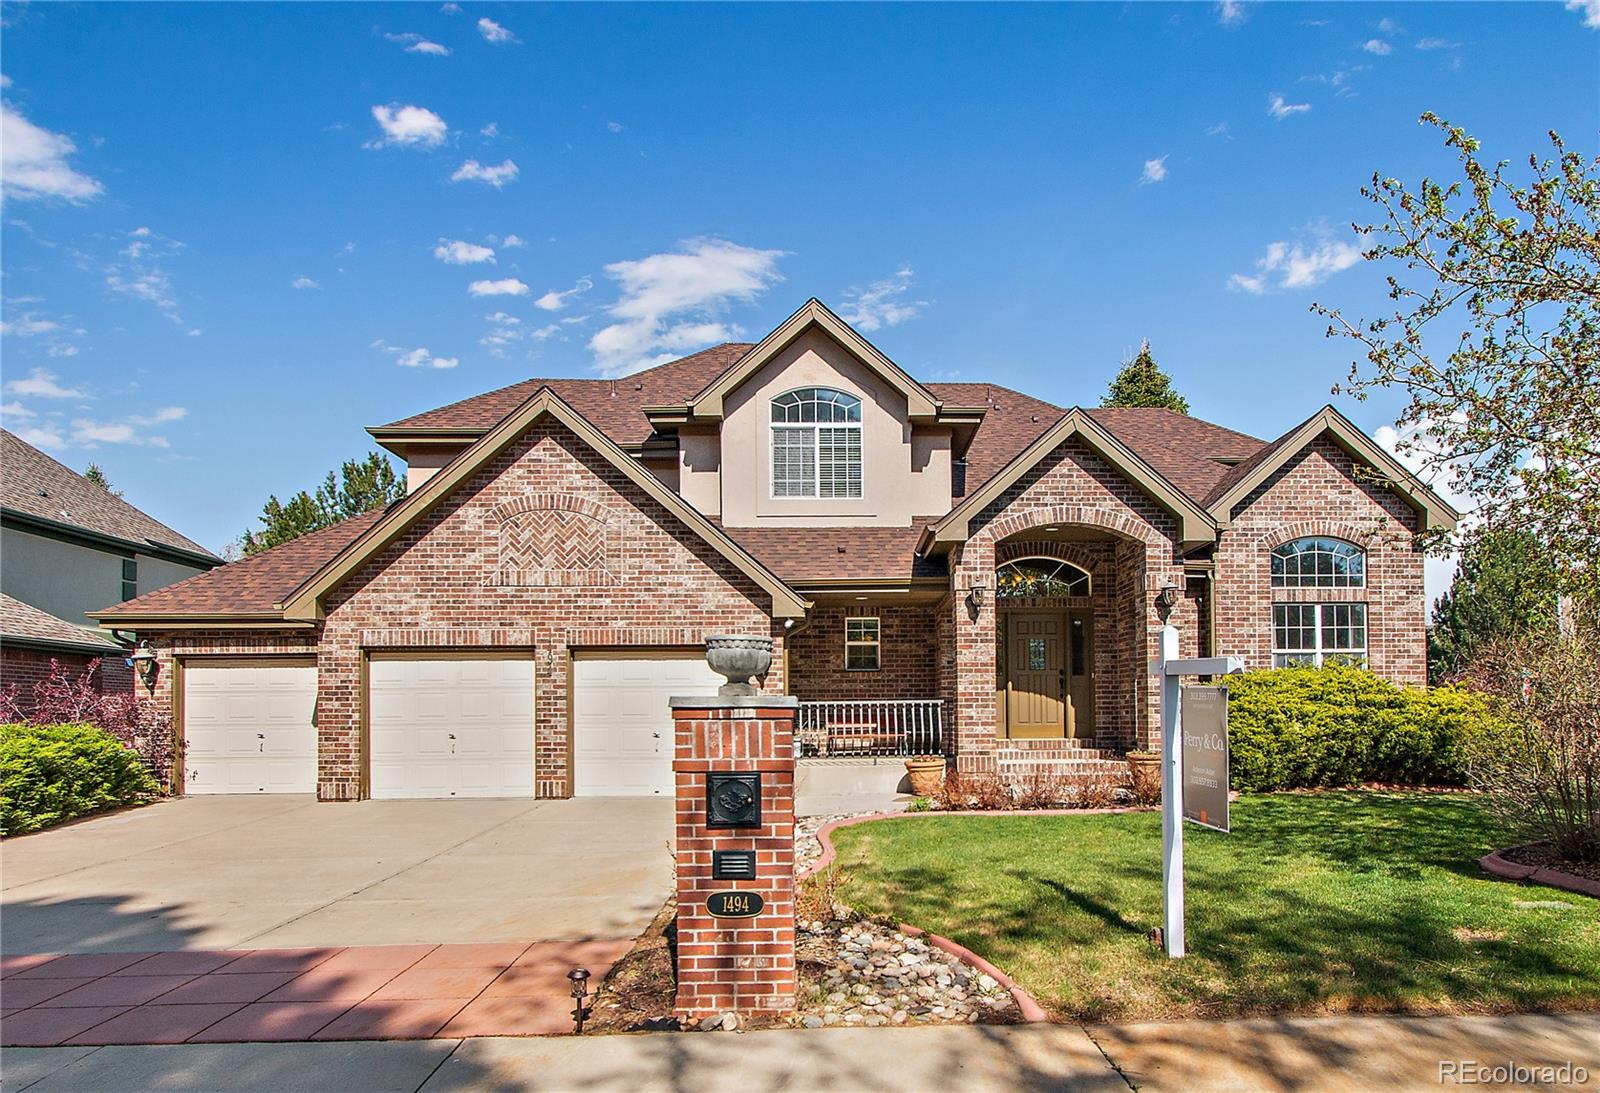 1494 S Uinta Court Property Photo - Denver, CO real estate listing